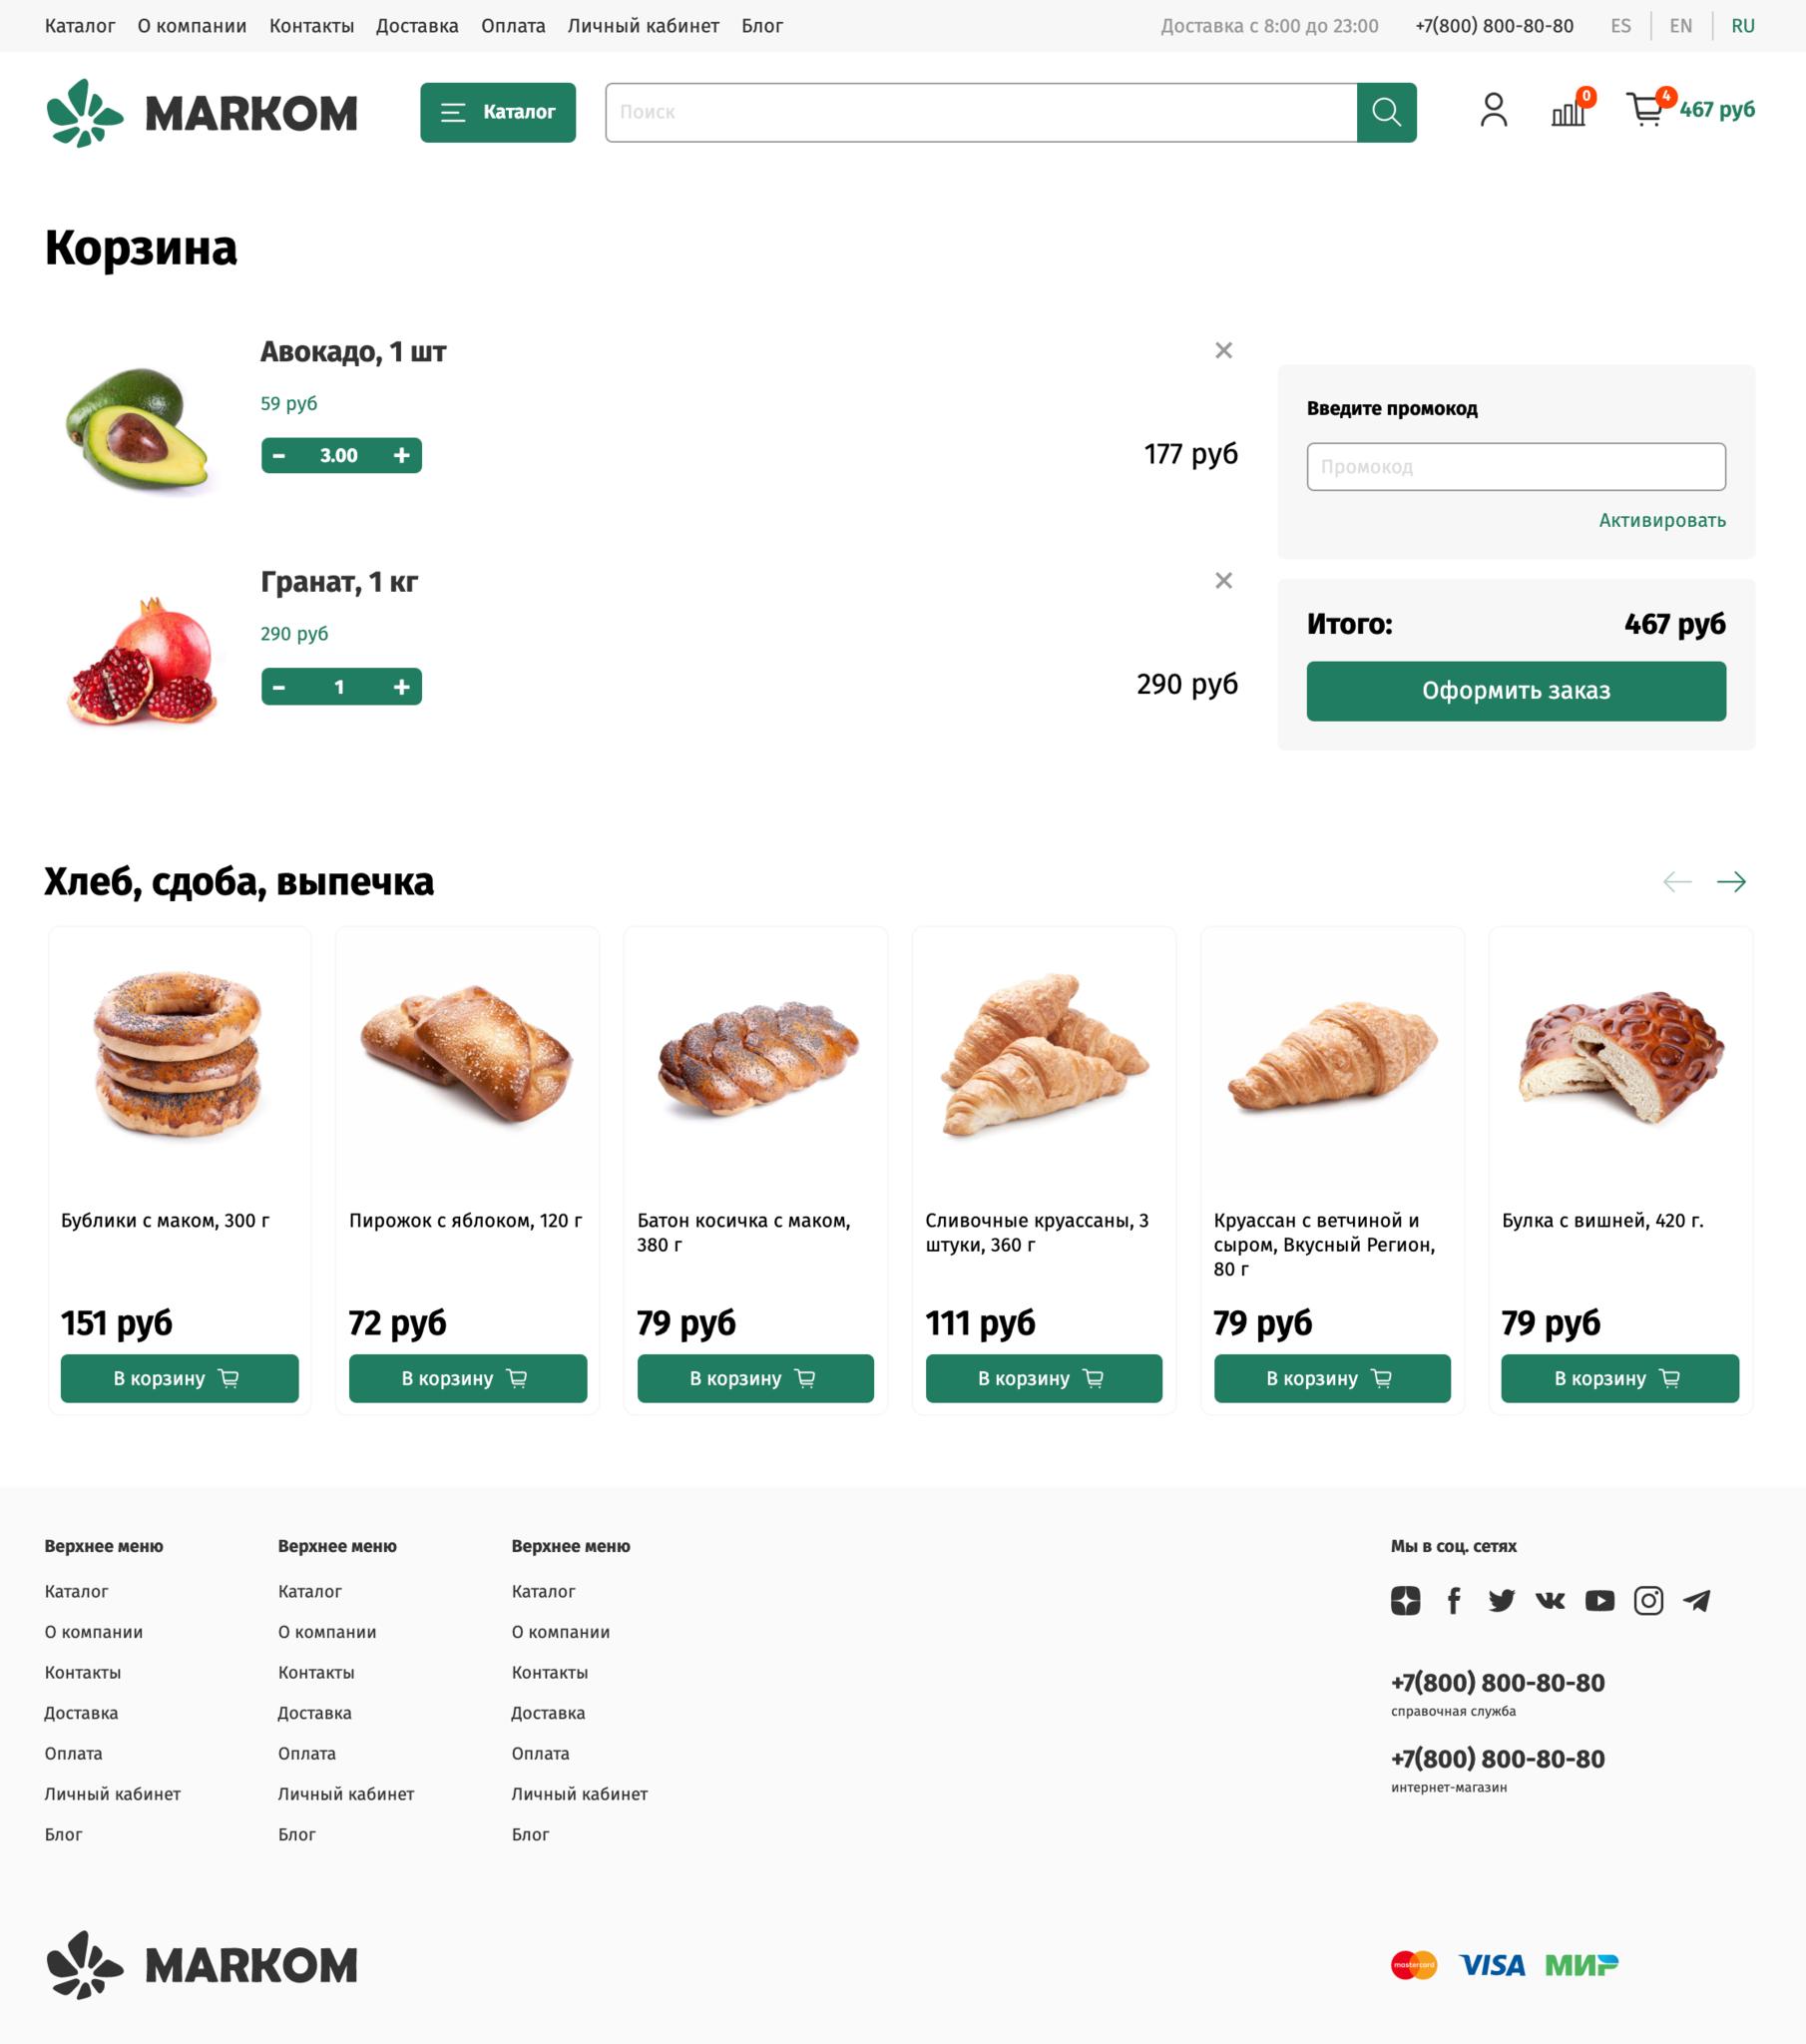 Шаблон интернет магазина - Markom